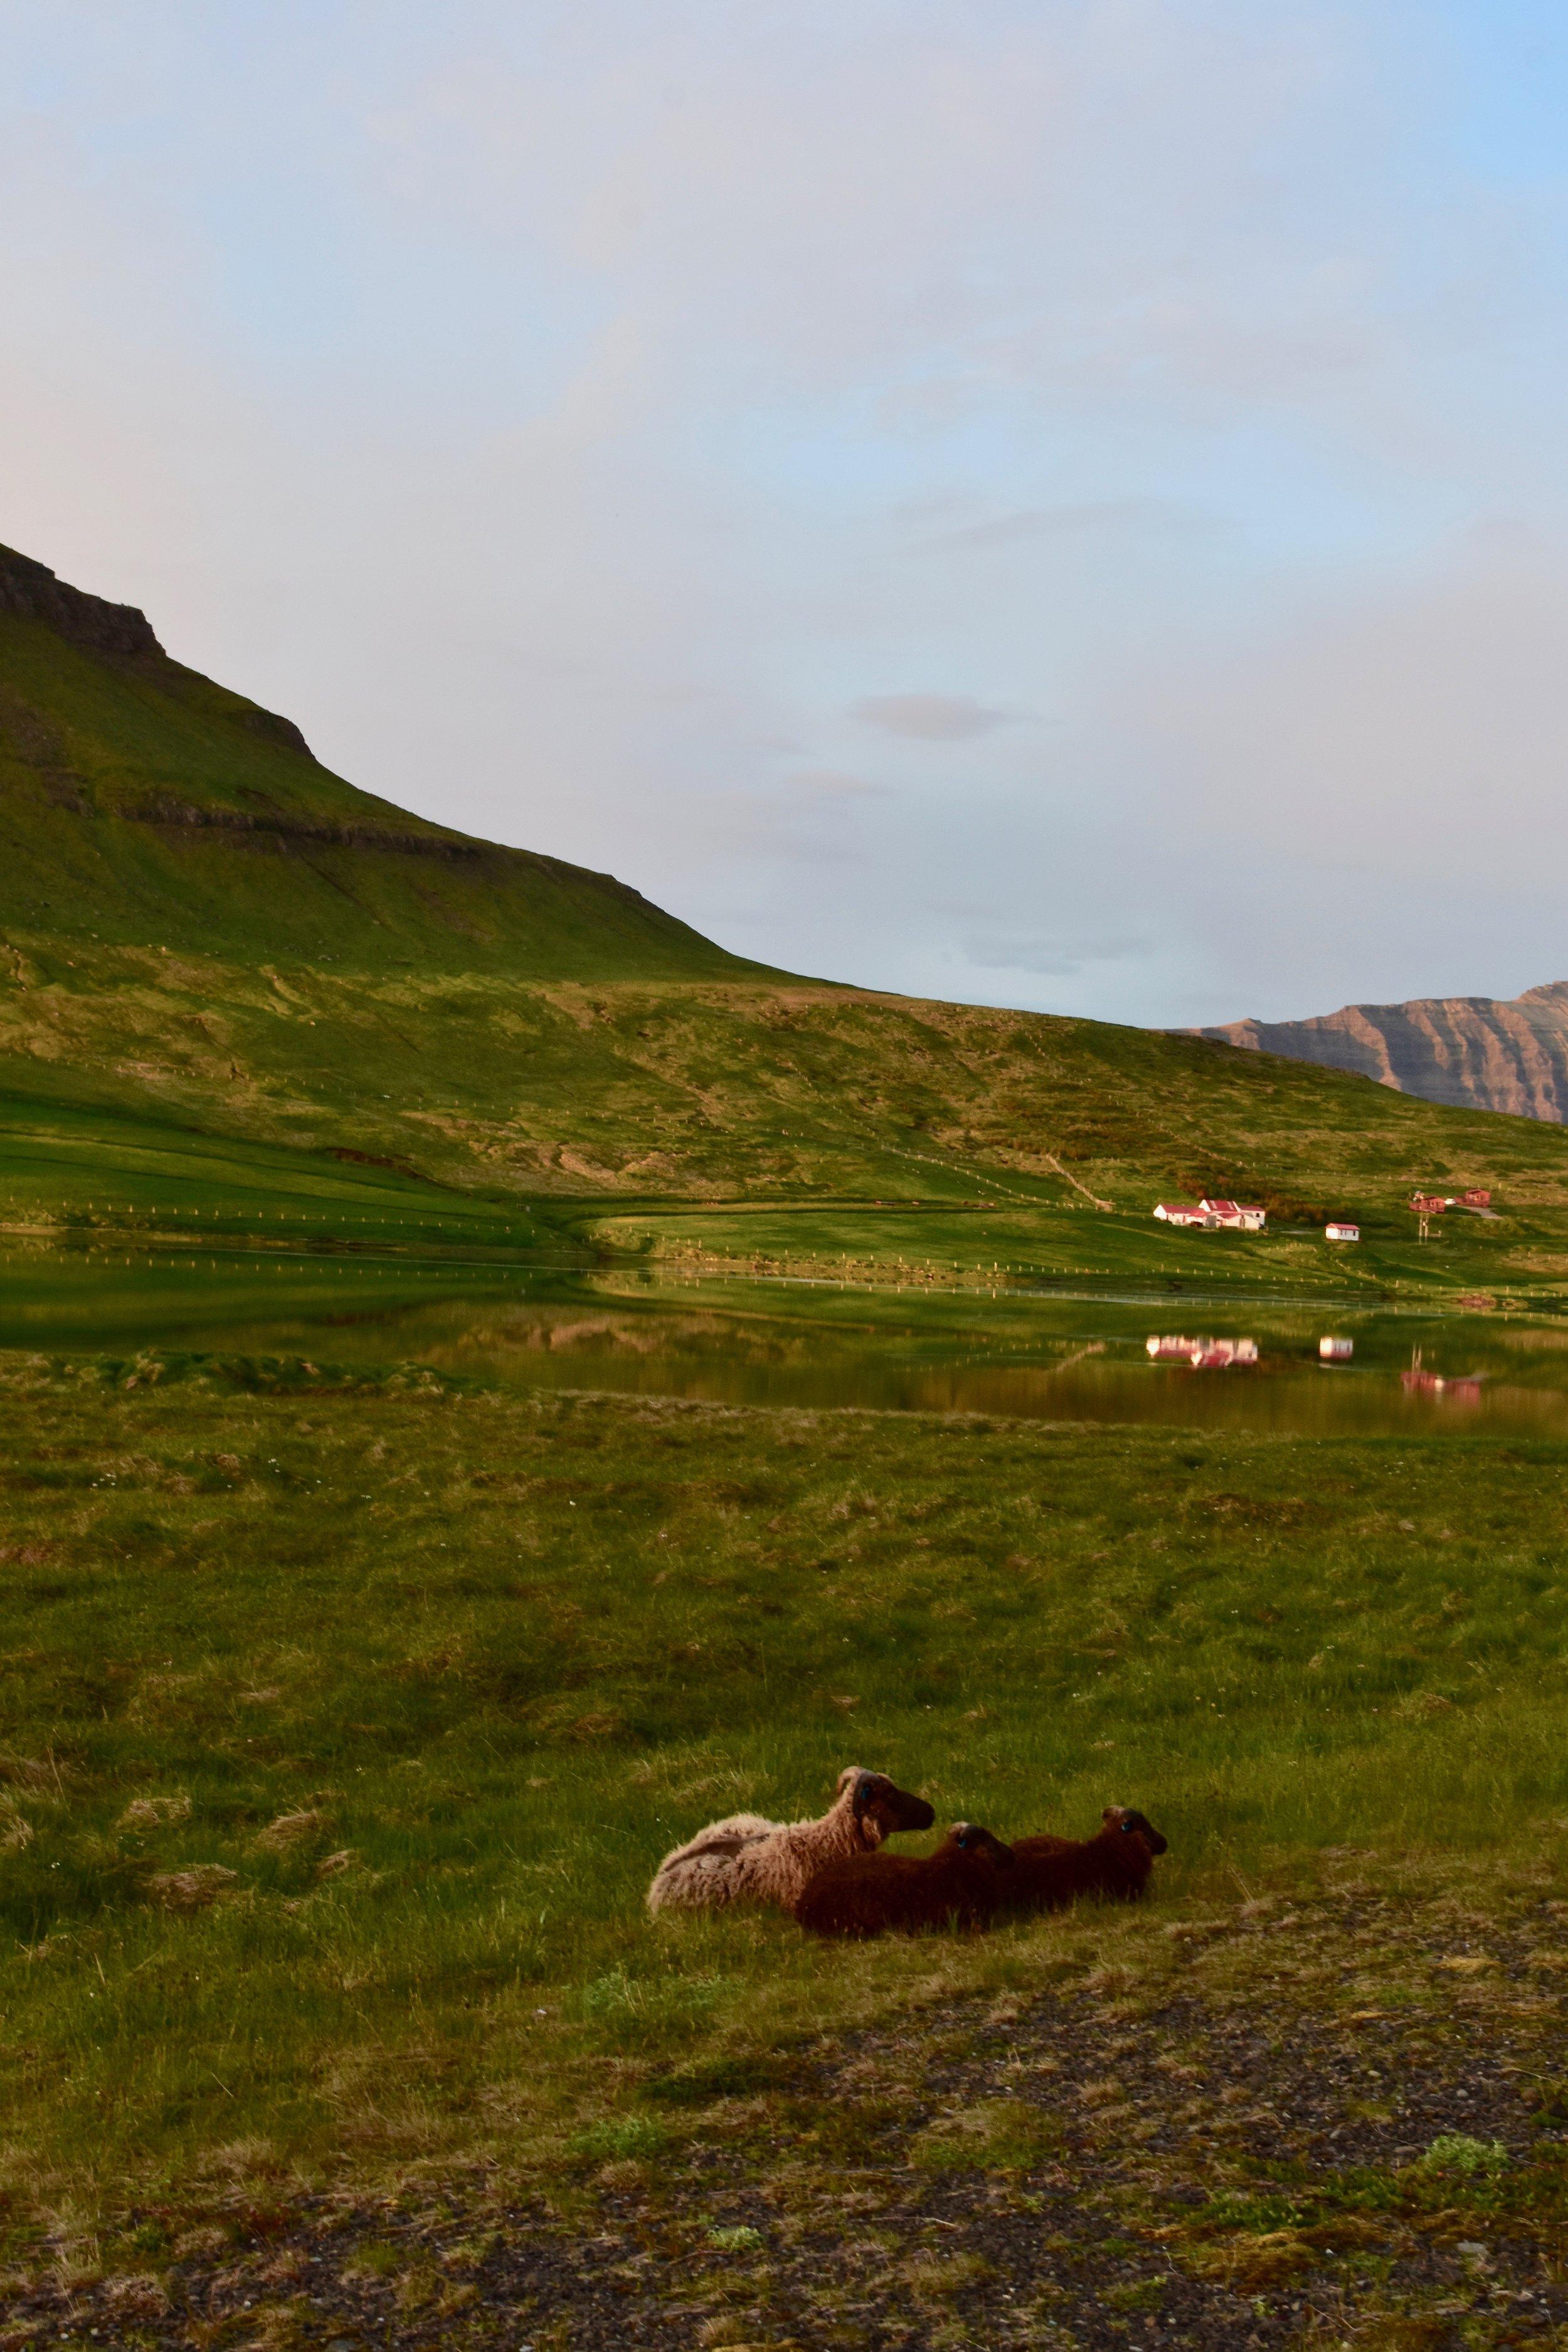 Sheep in front of Kirkjufell Mountain on Snæfellsnes Peninsula, Iceland